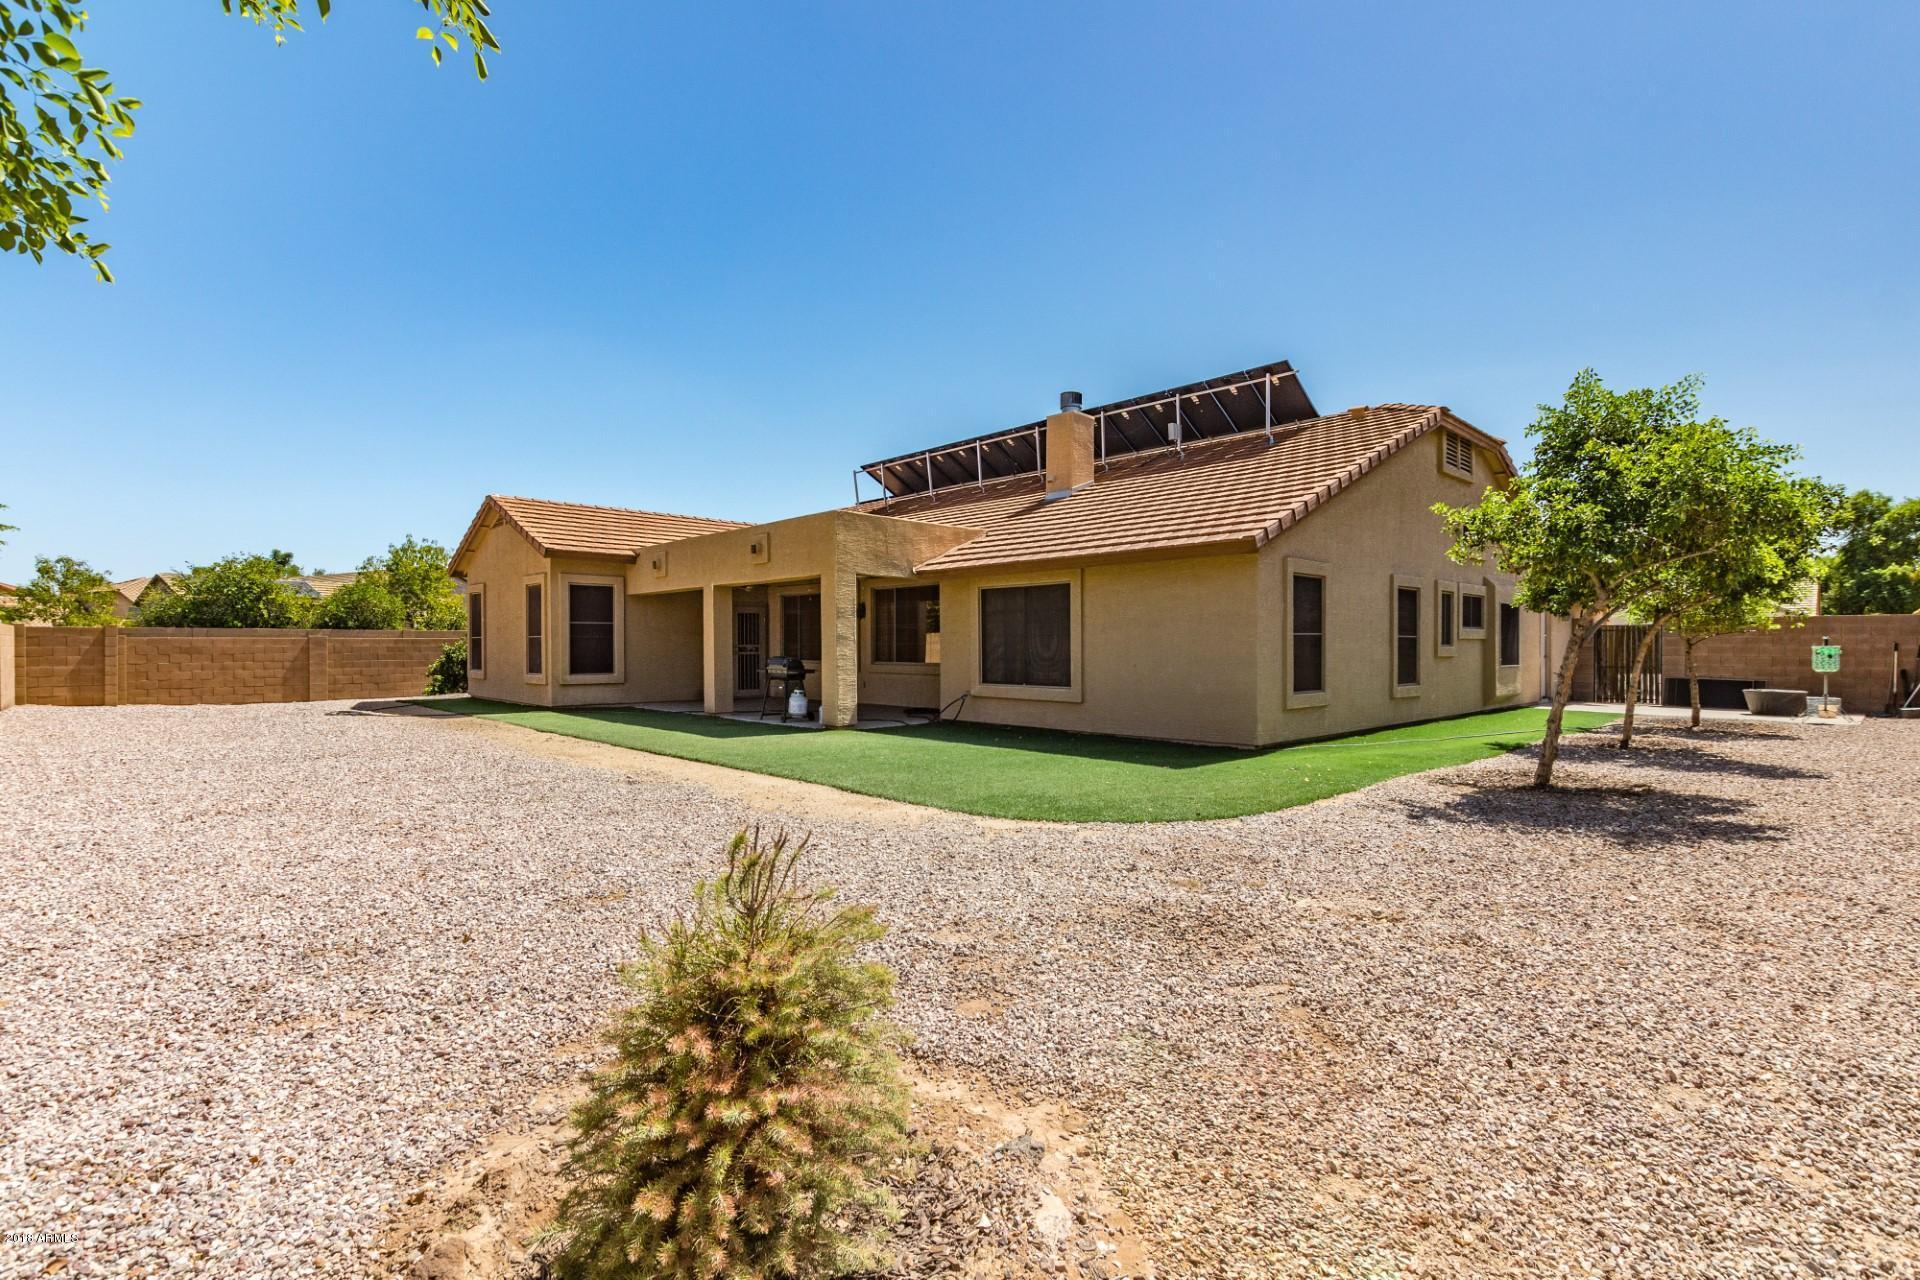 MLS 5819408 3260 E KIMBALL Court, Gilbert, AZ 85297 Gilbert AZ Coronado Ranch